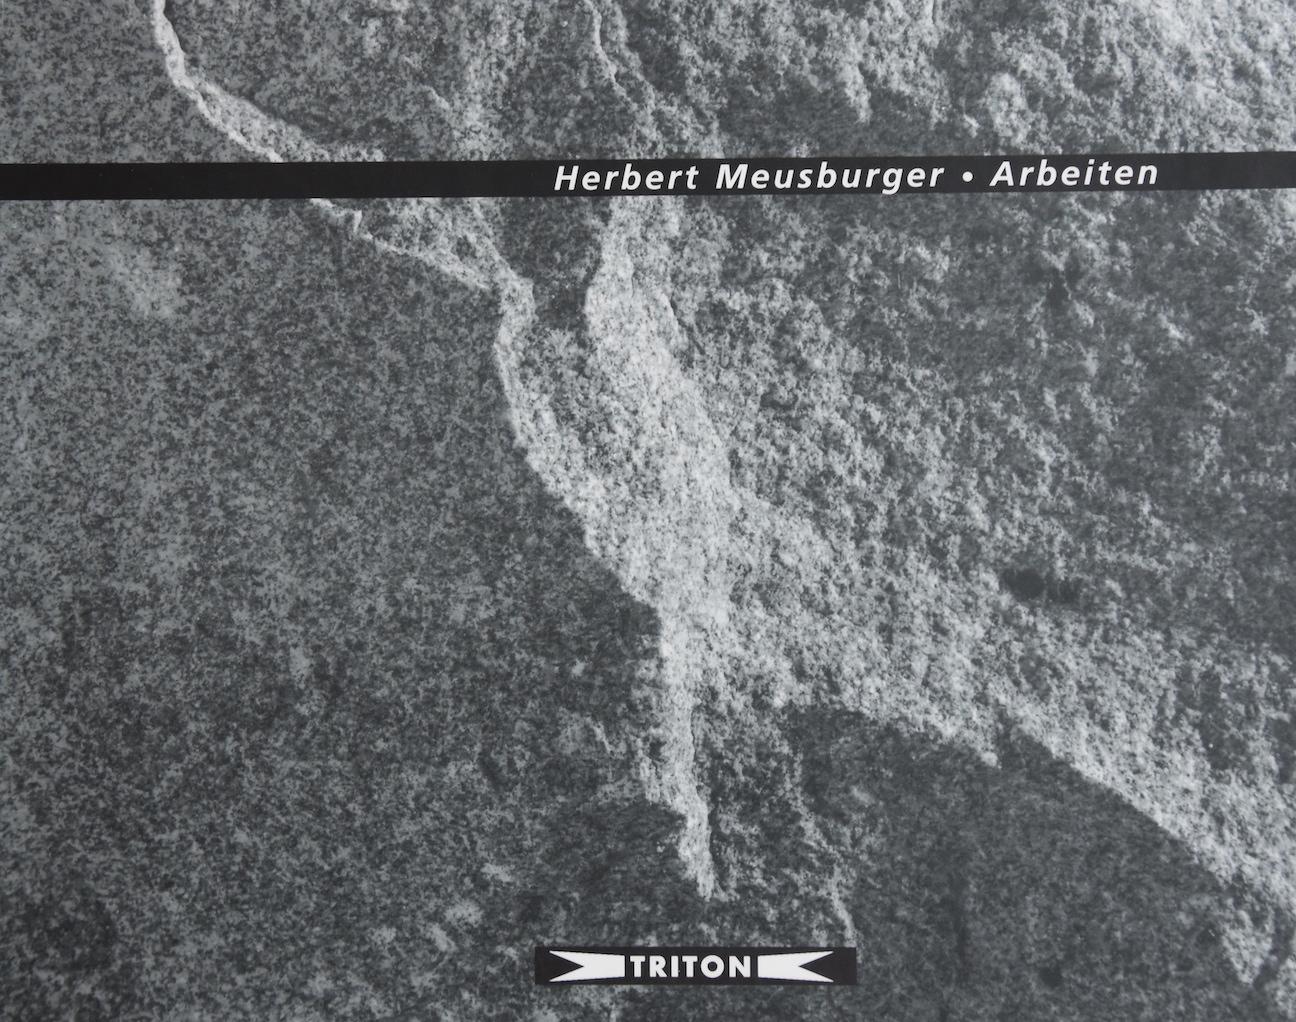 Herbert Meusburger - Arbeiten, Triton Verlag 1999